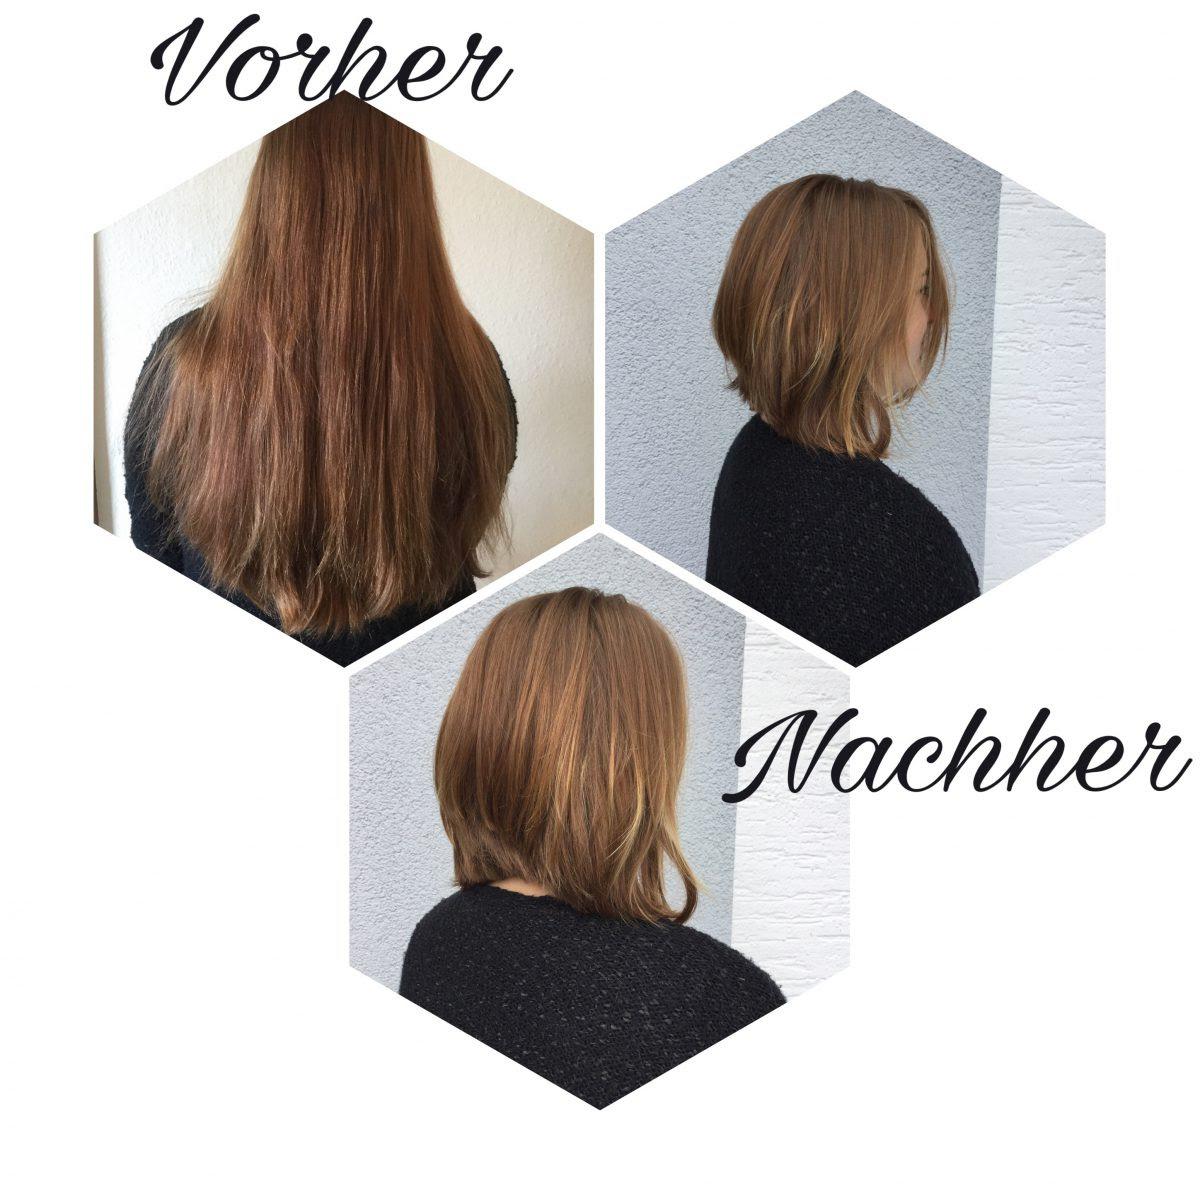 Vorhernachher Salon Brünger Friseur